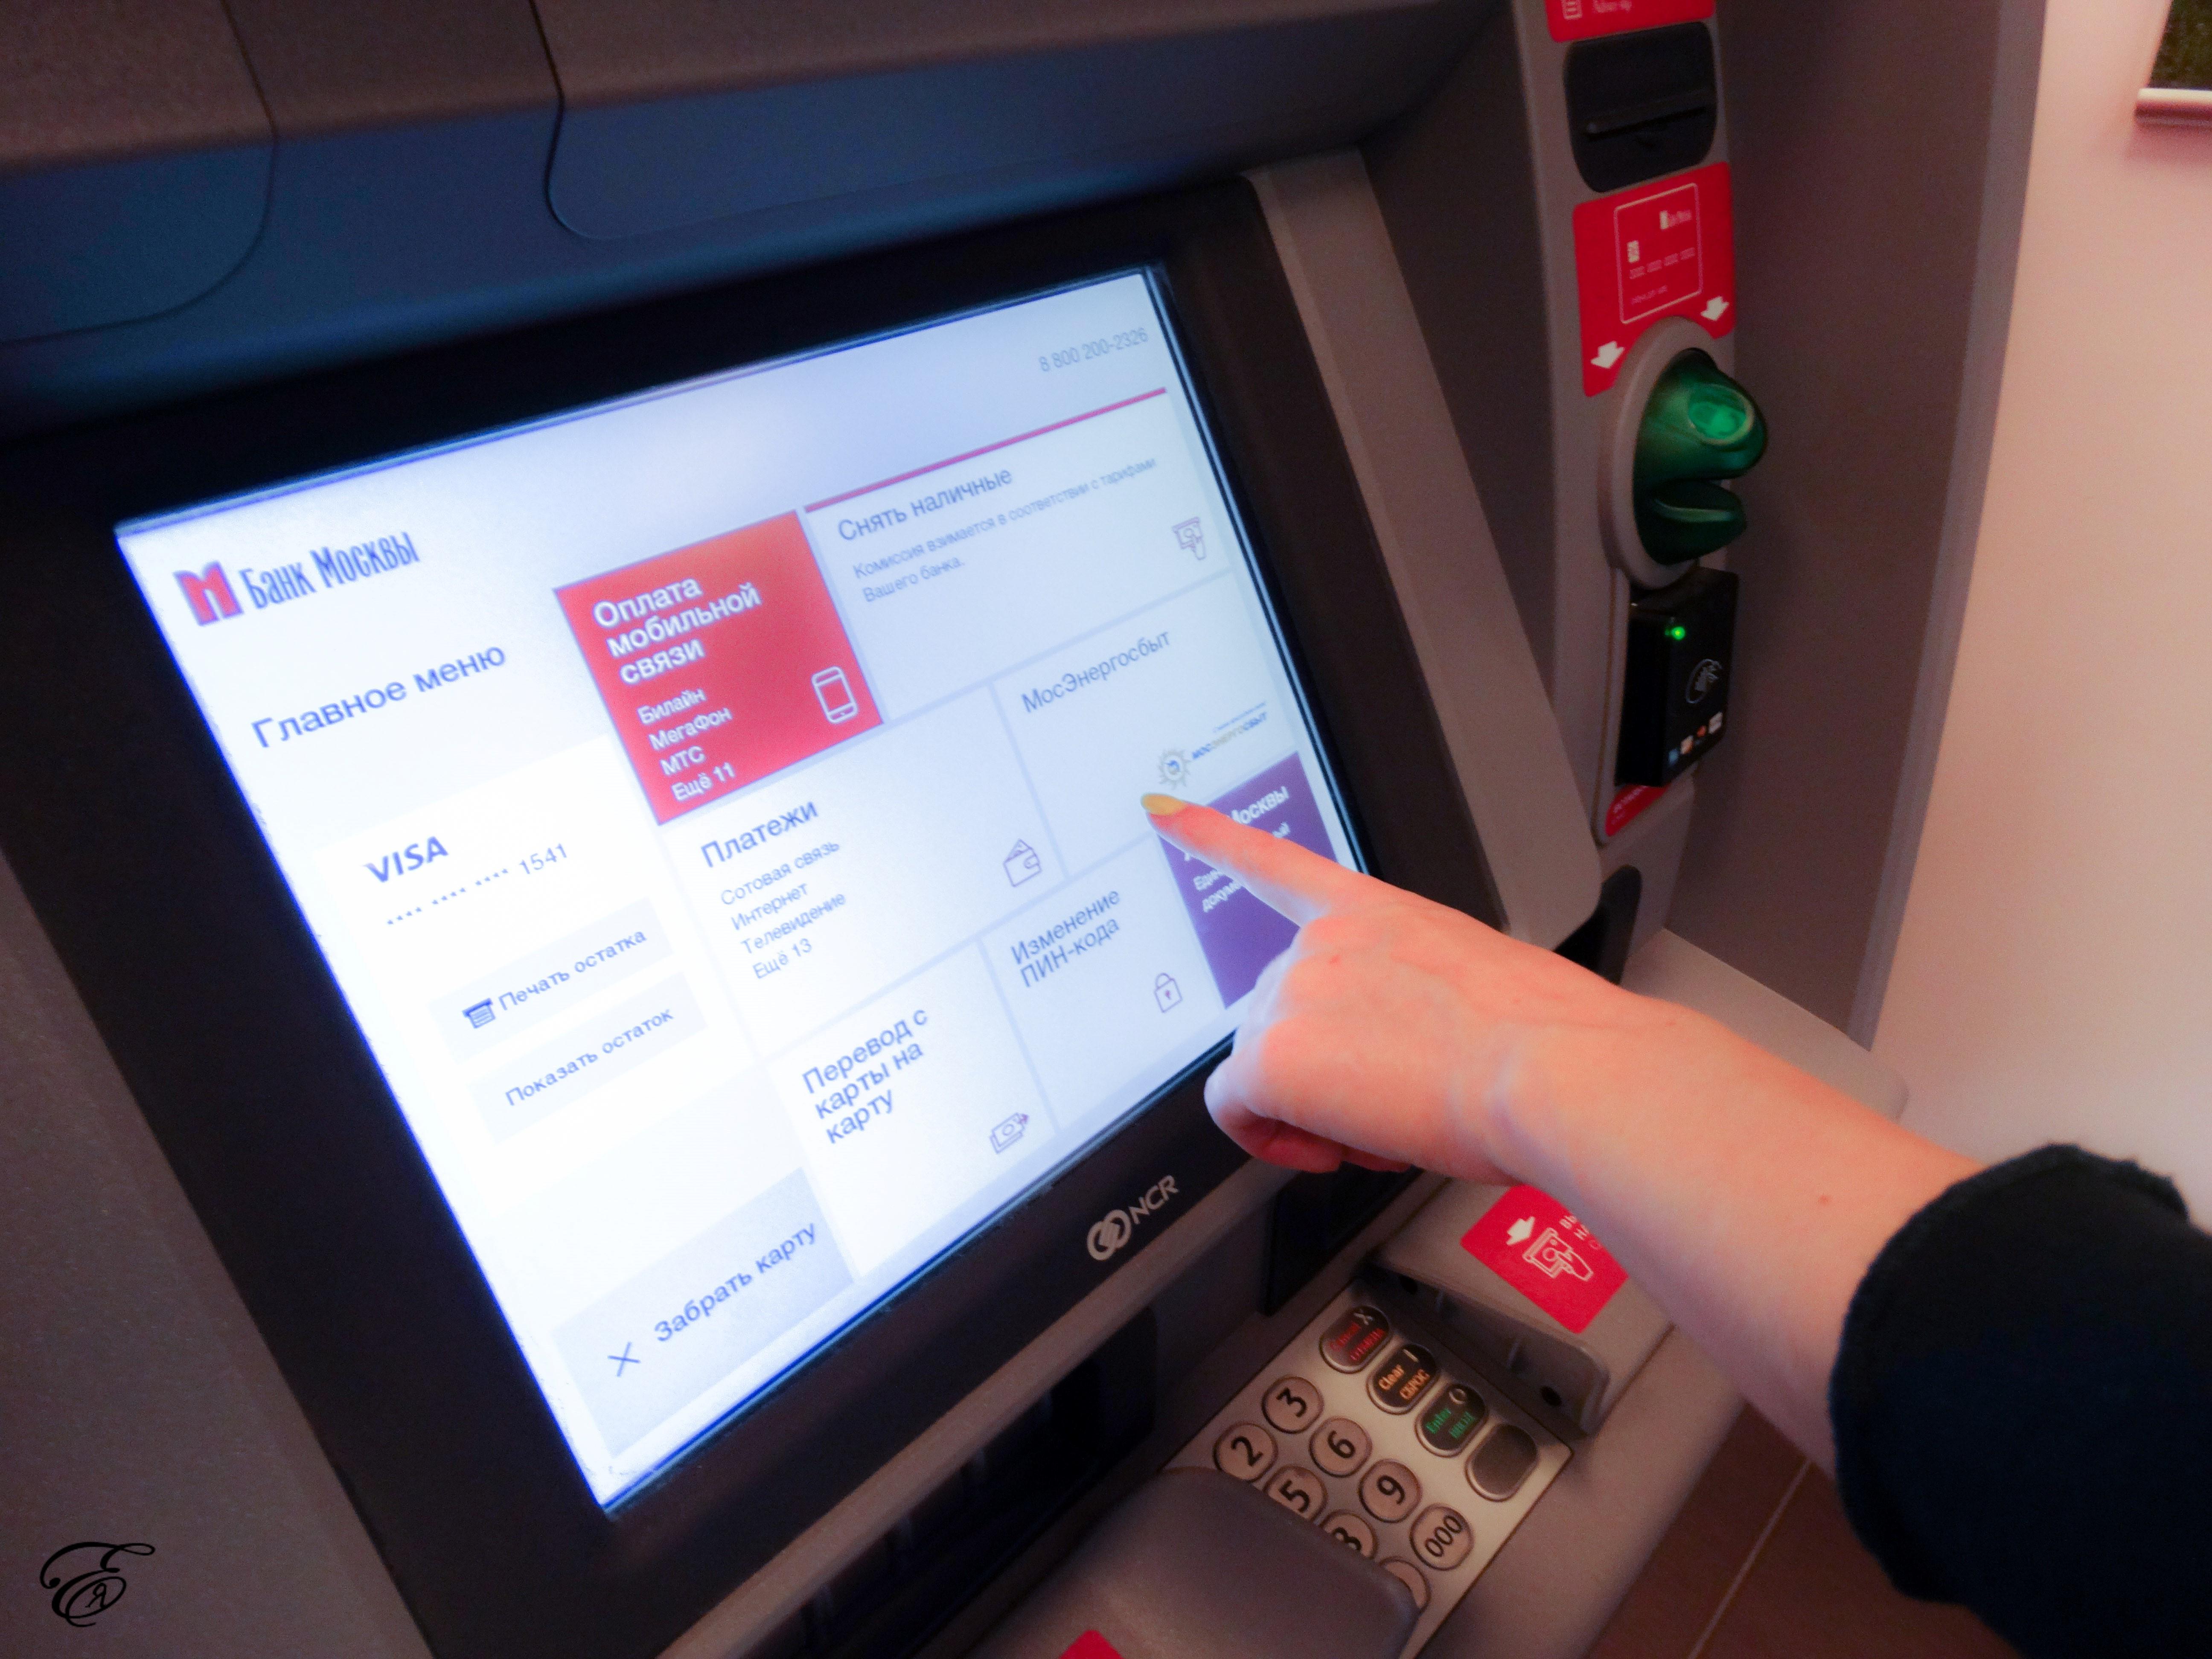 ВТБ Банк Москвы банкомат